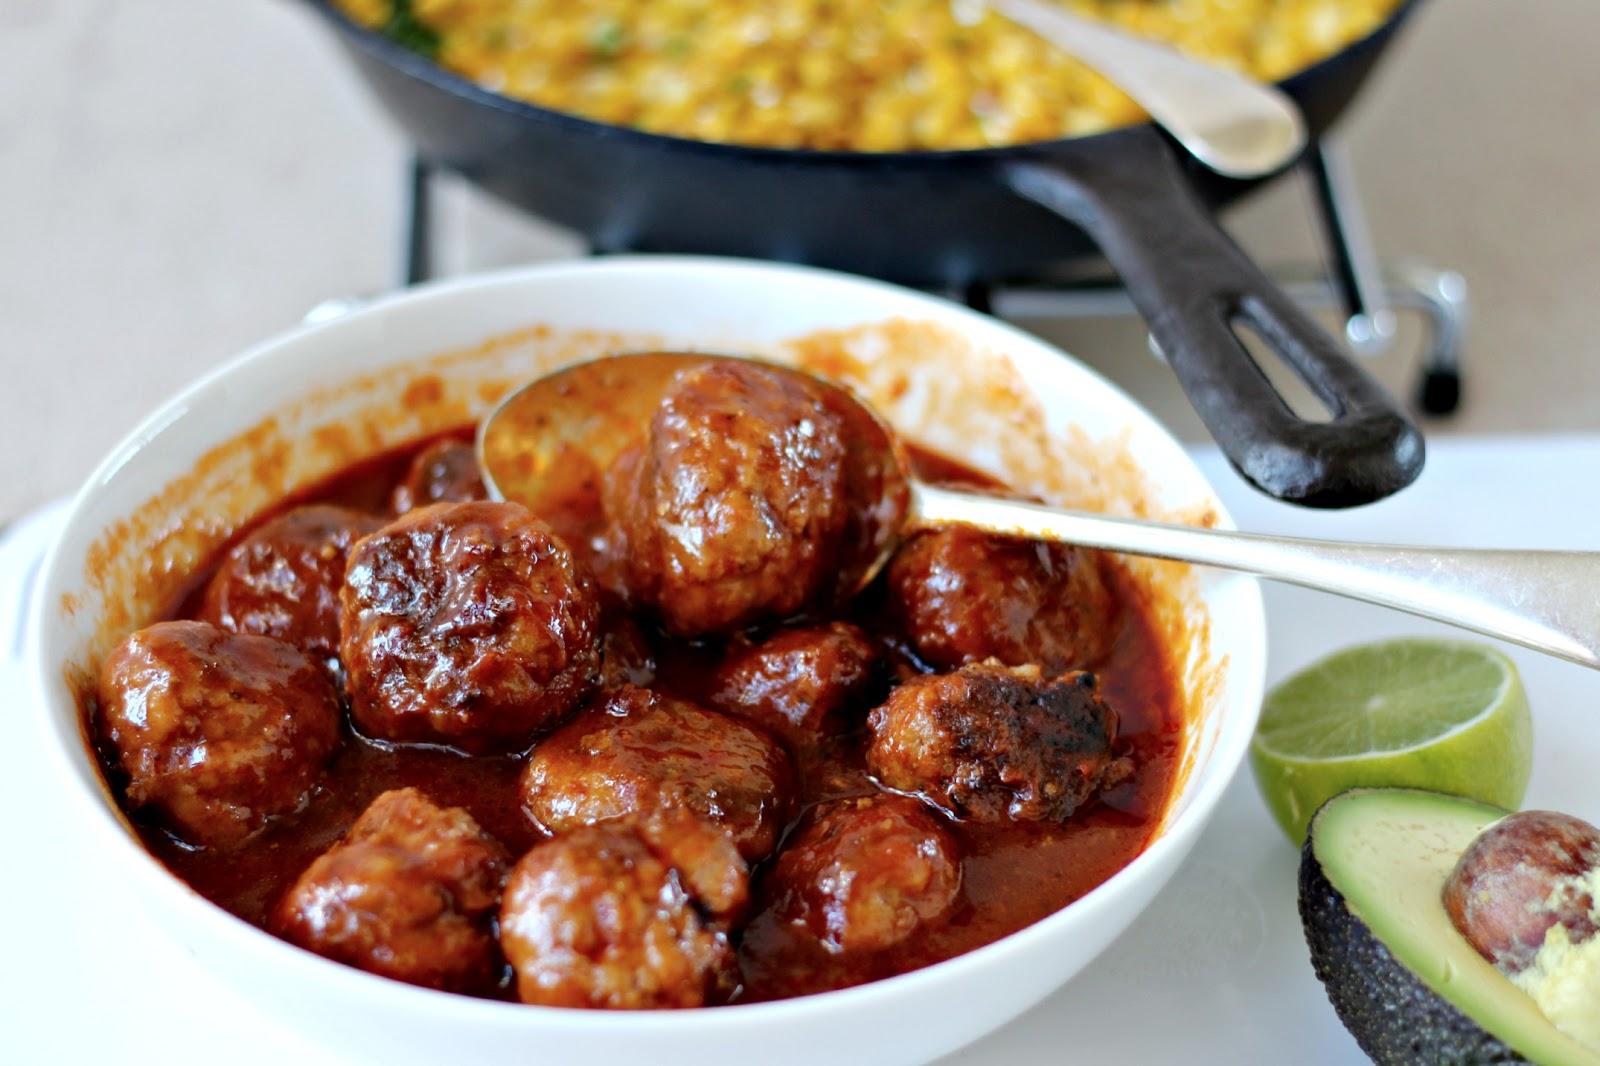 Milk and Honey: Meatballs in Barbecue Sauce